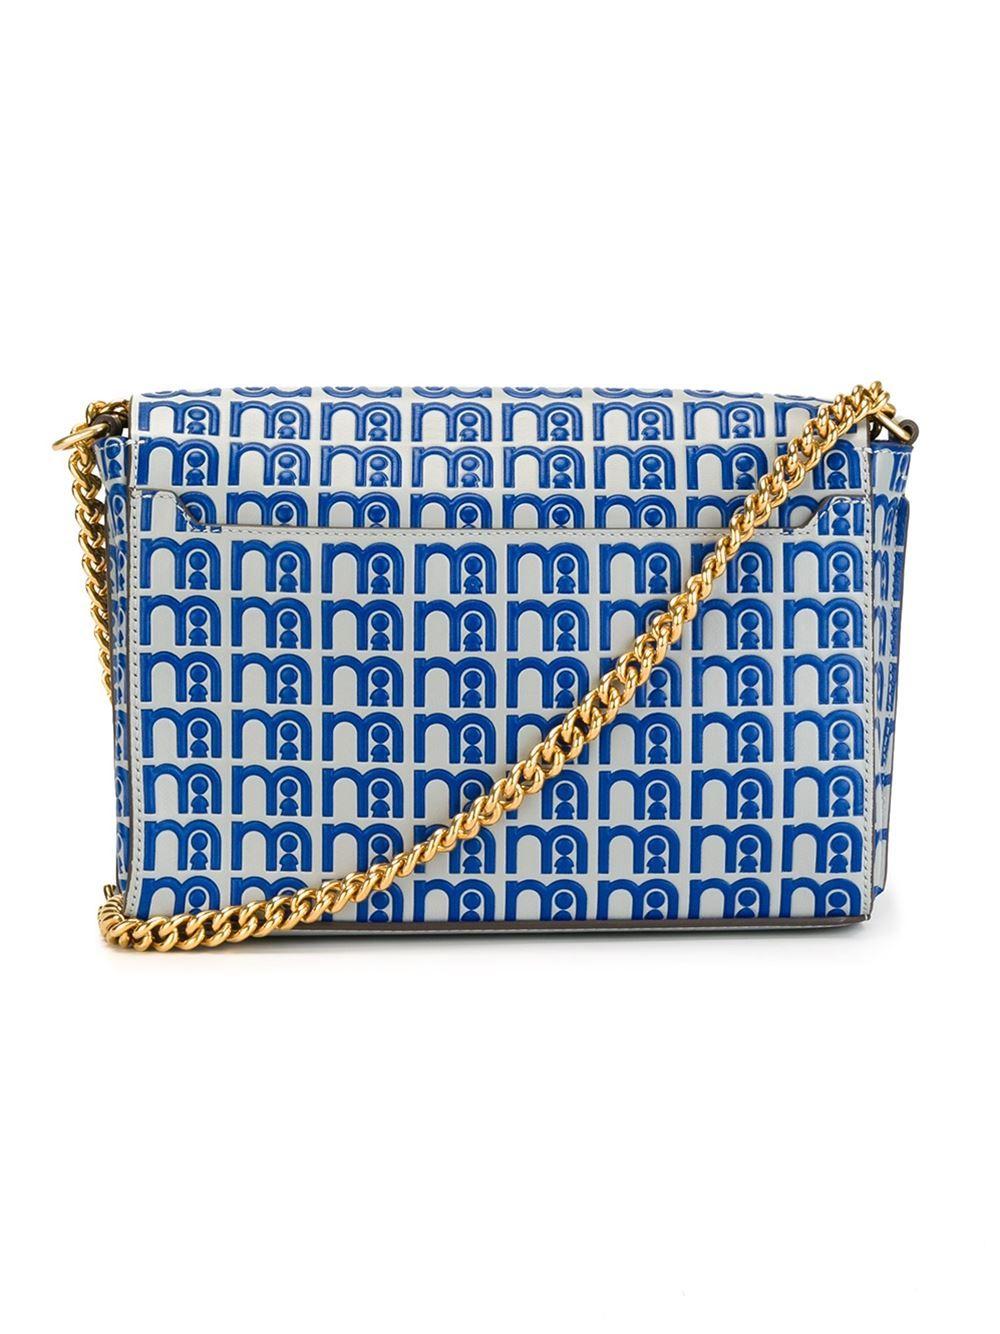 Anya Hindmarch gold-tone chain strap crossbody bag